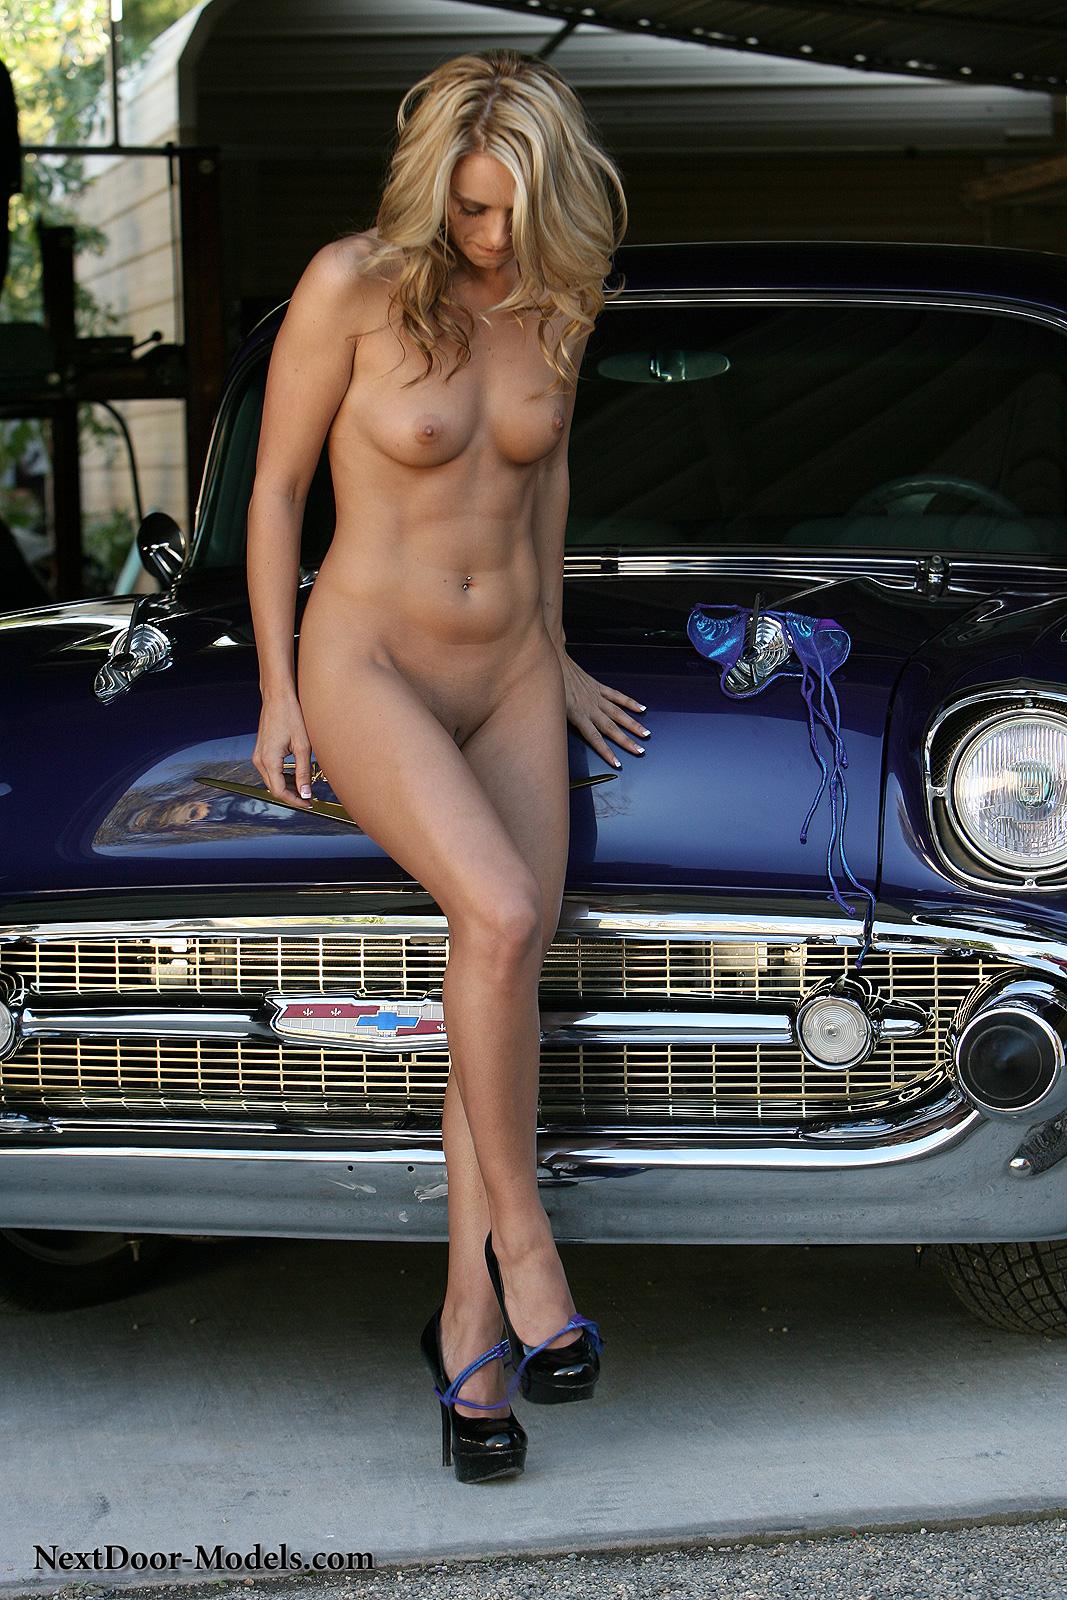 Britney car in nude